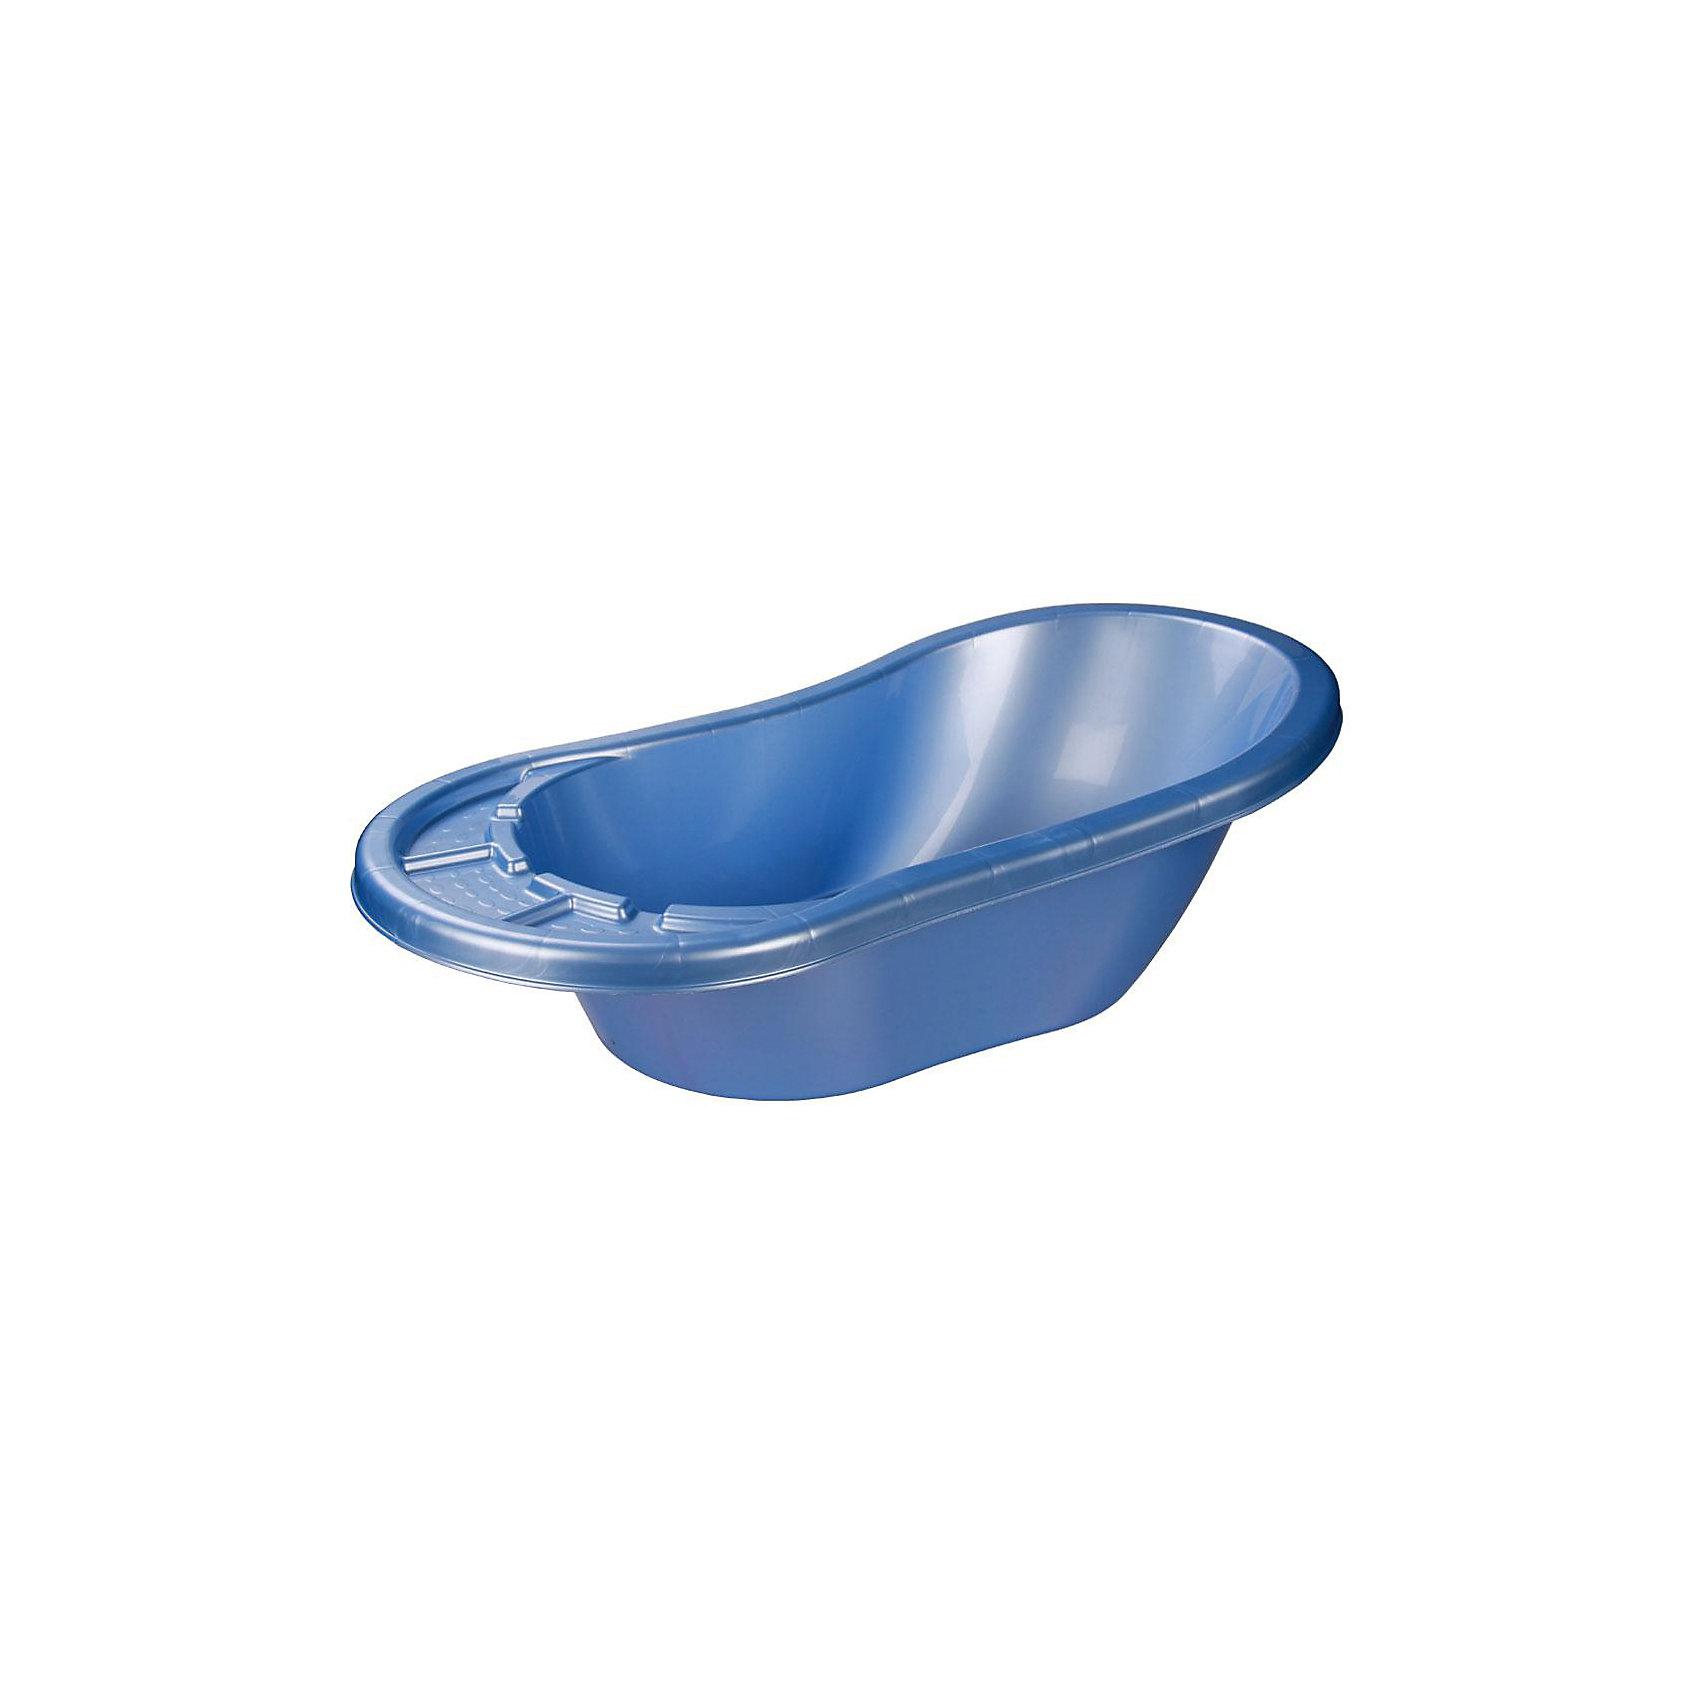 Alternativa Ванночка Карапуз, Alternativa, голубой alternativa горка для купания alternativa розовый